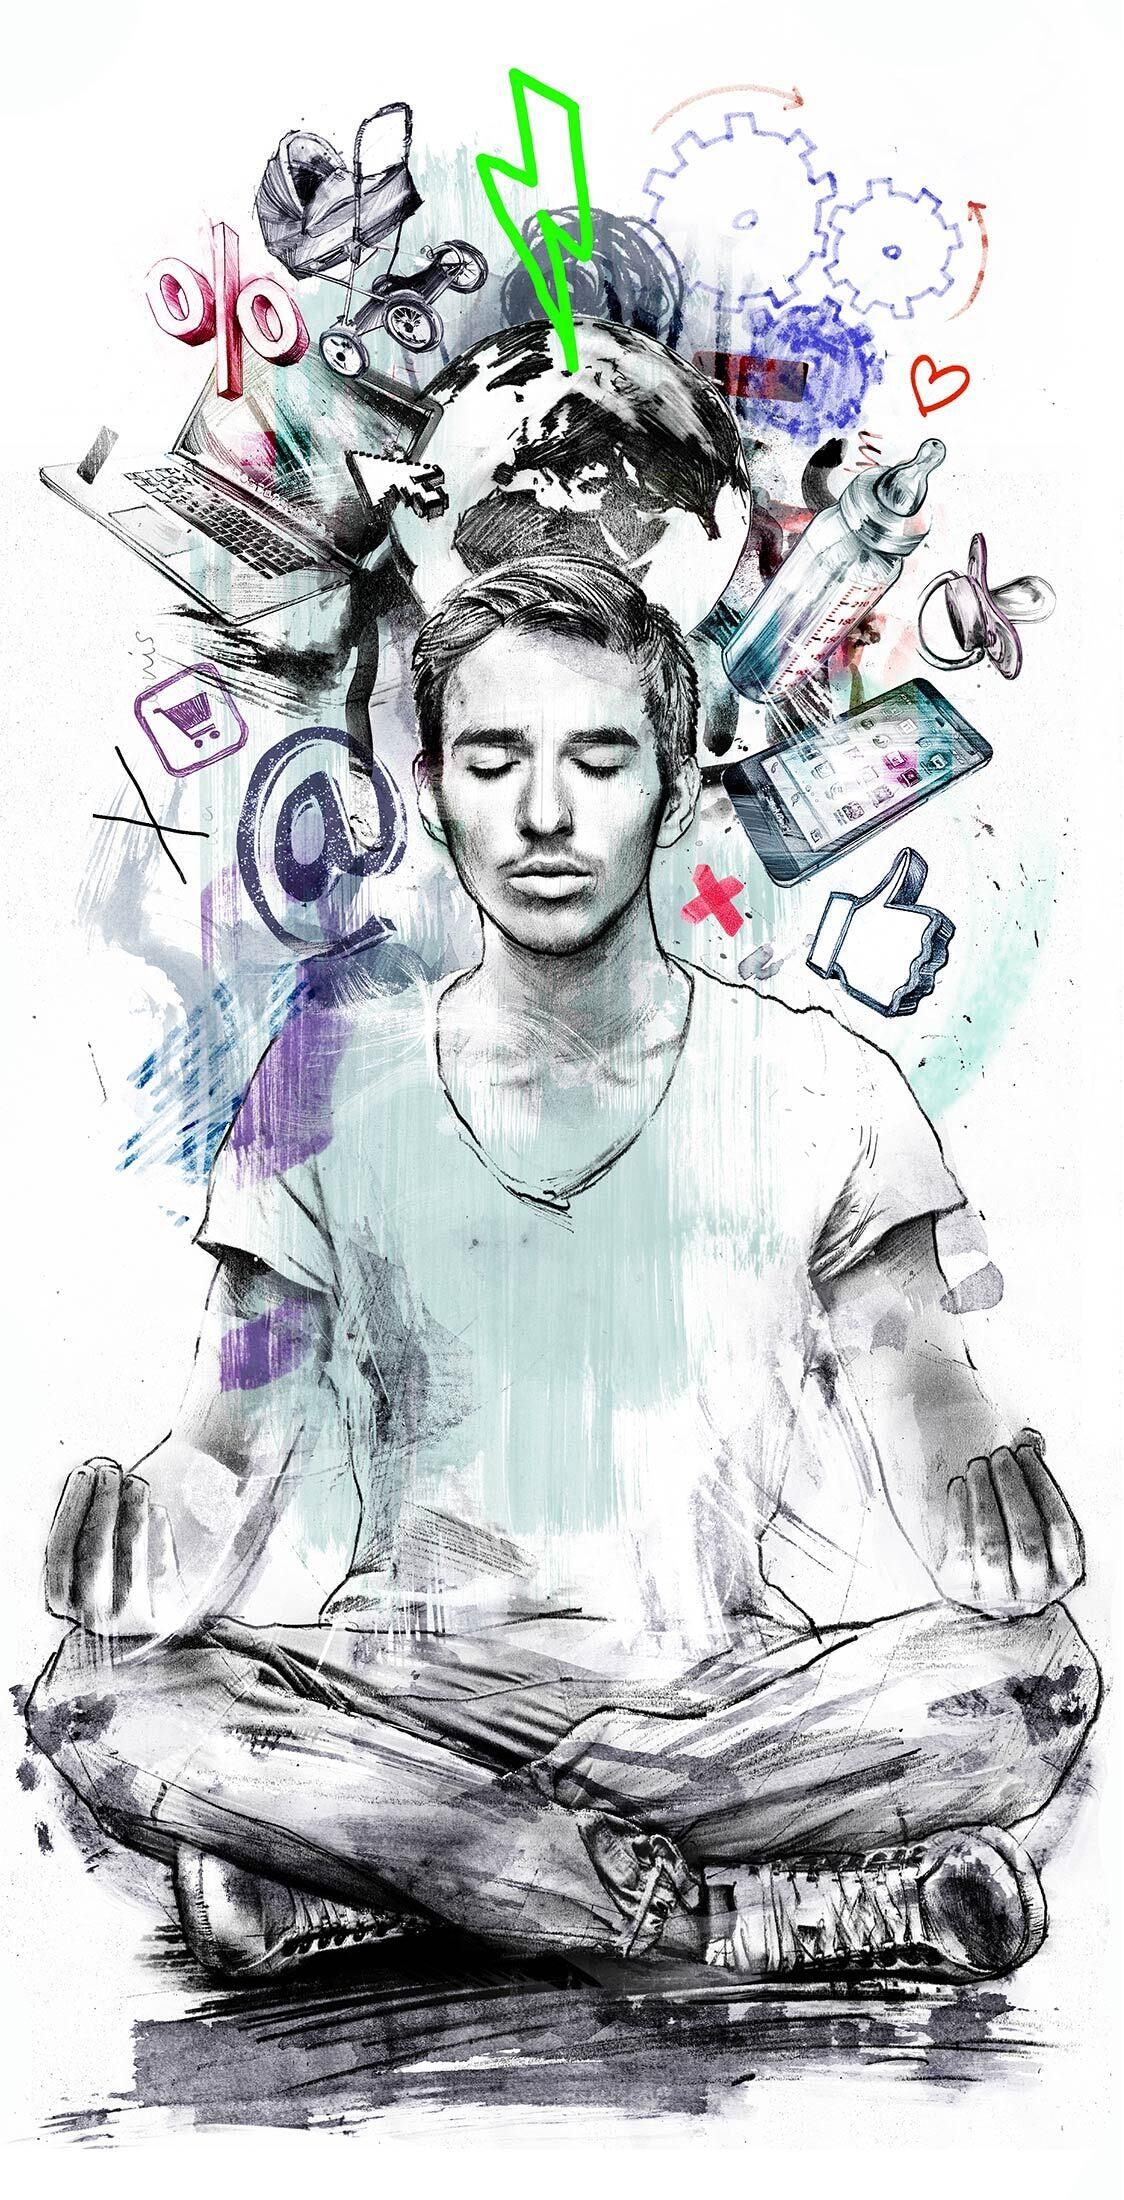 Stress youth editorial illustration - Kornel Illustration   Kornel Stadler portfolio